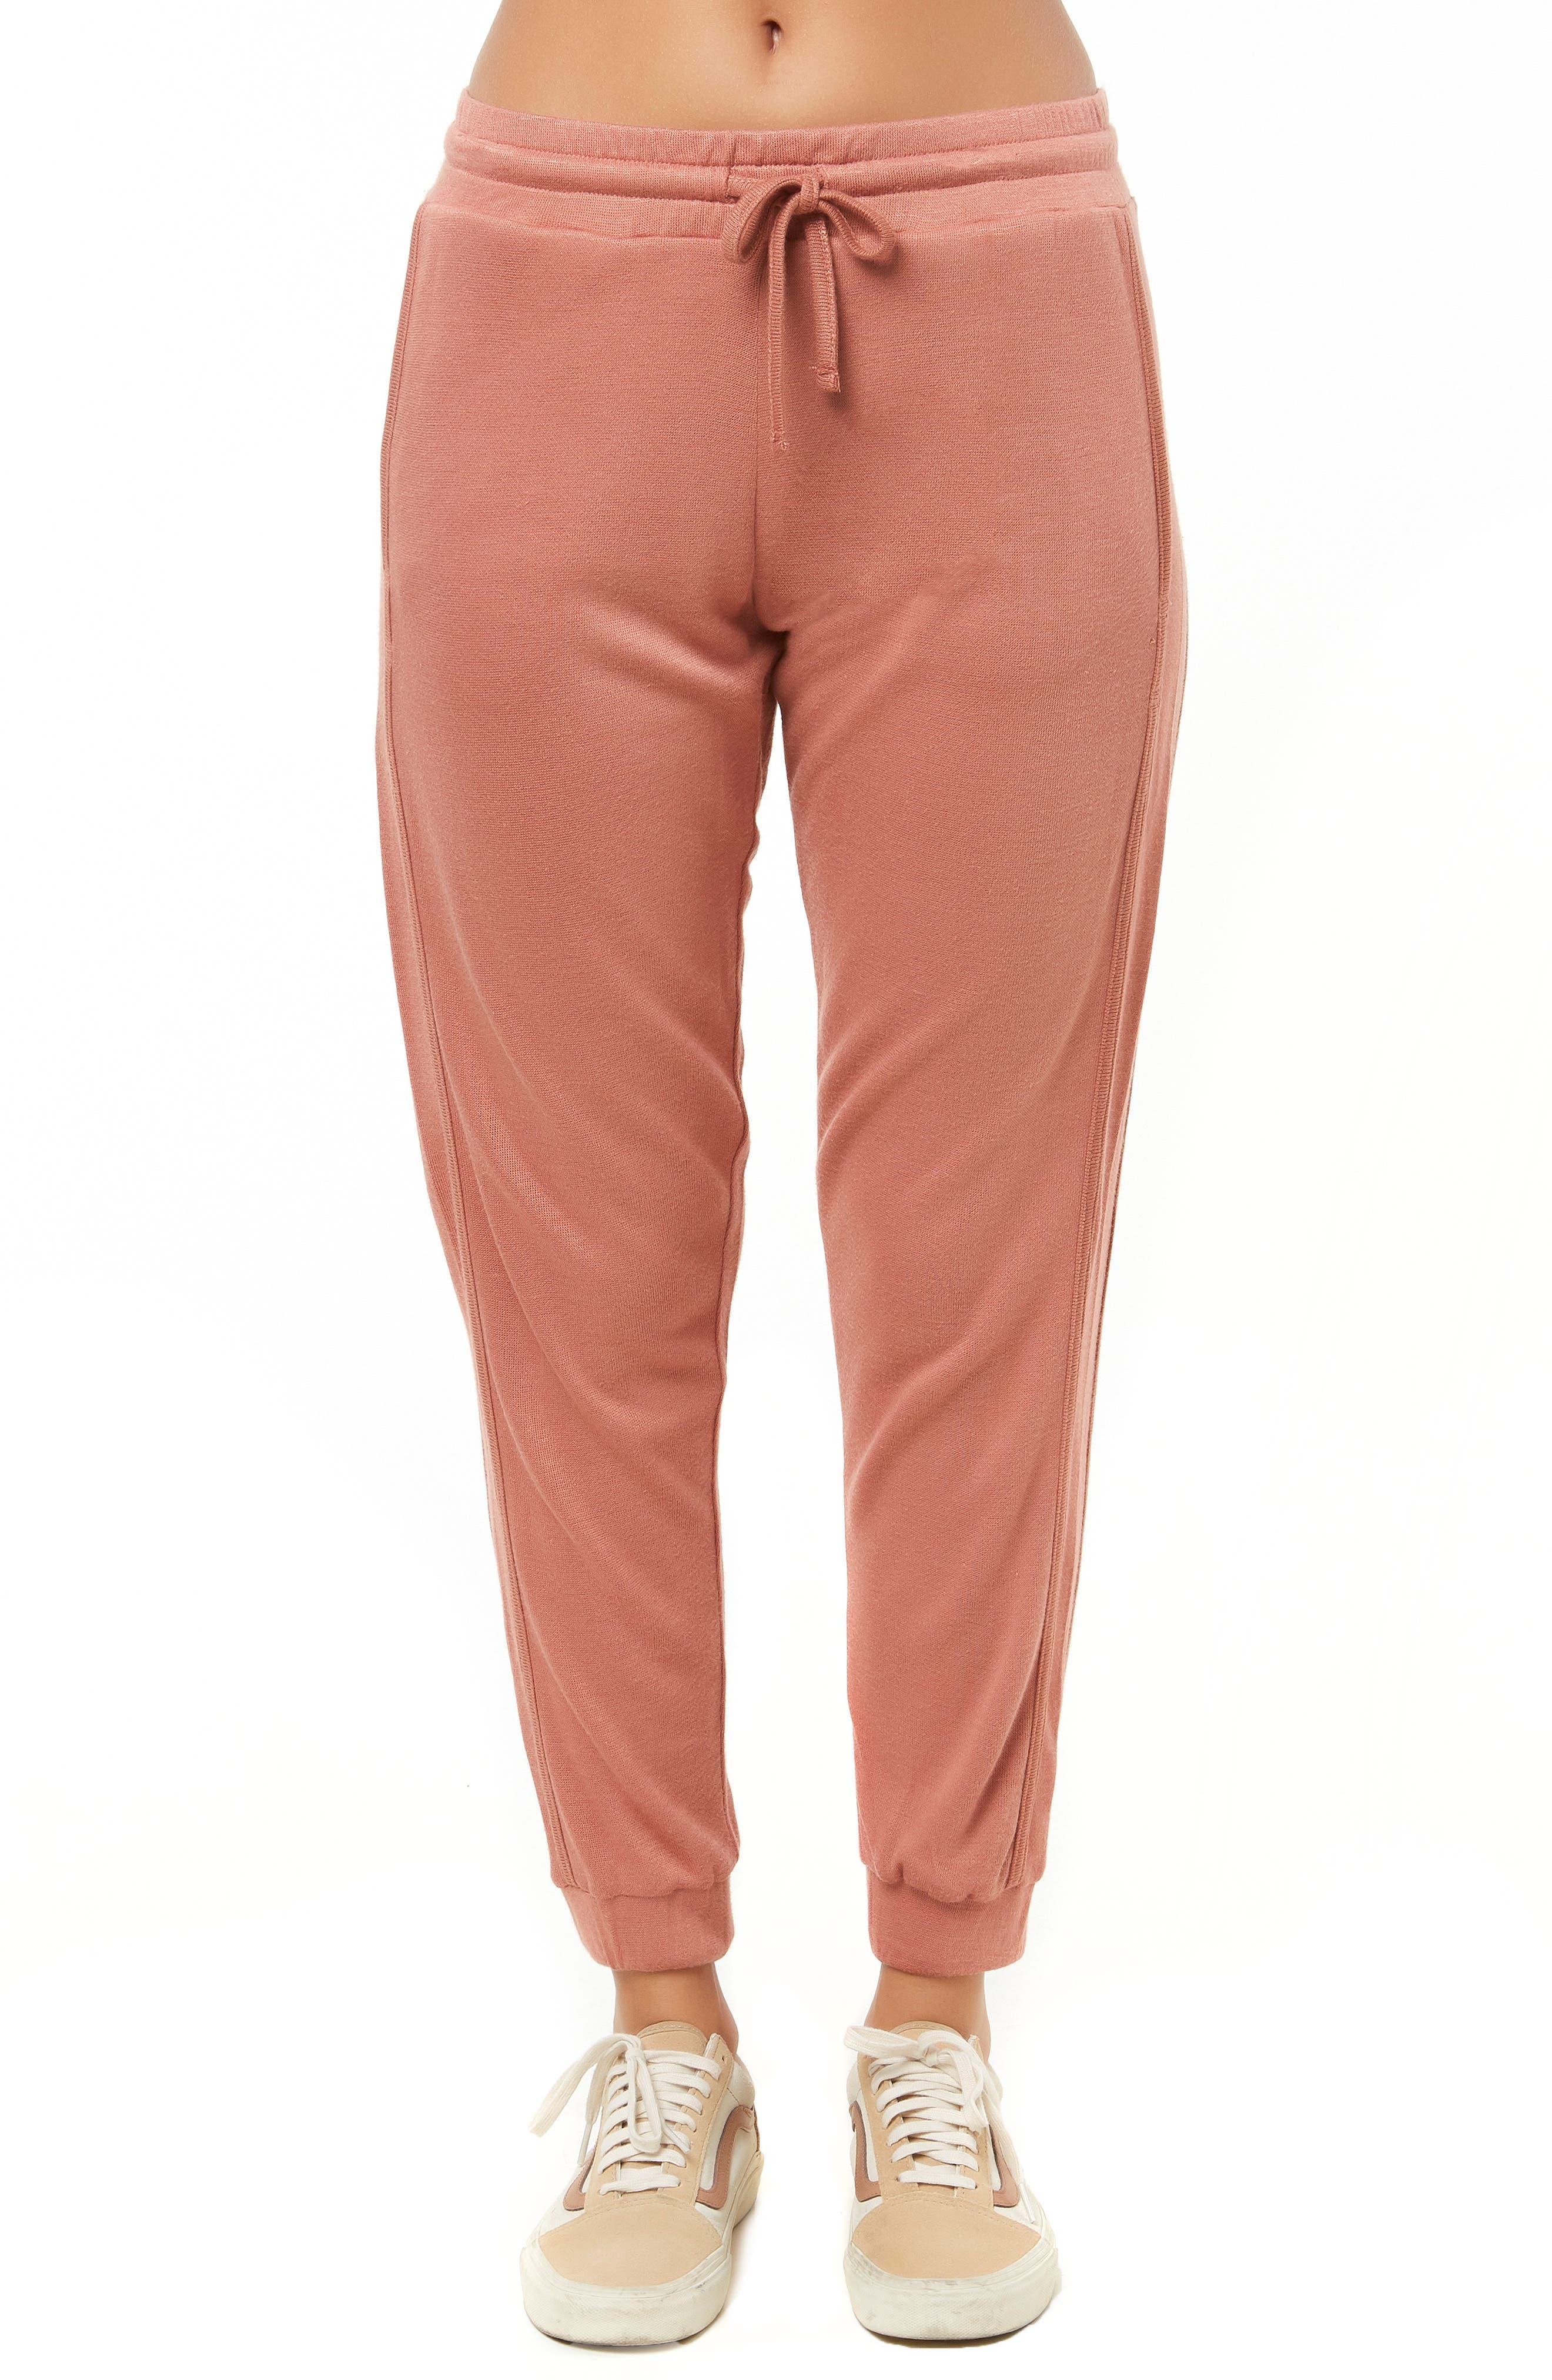 O'NEILL Omni Fleece Jogger Pants, Main, color, 650